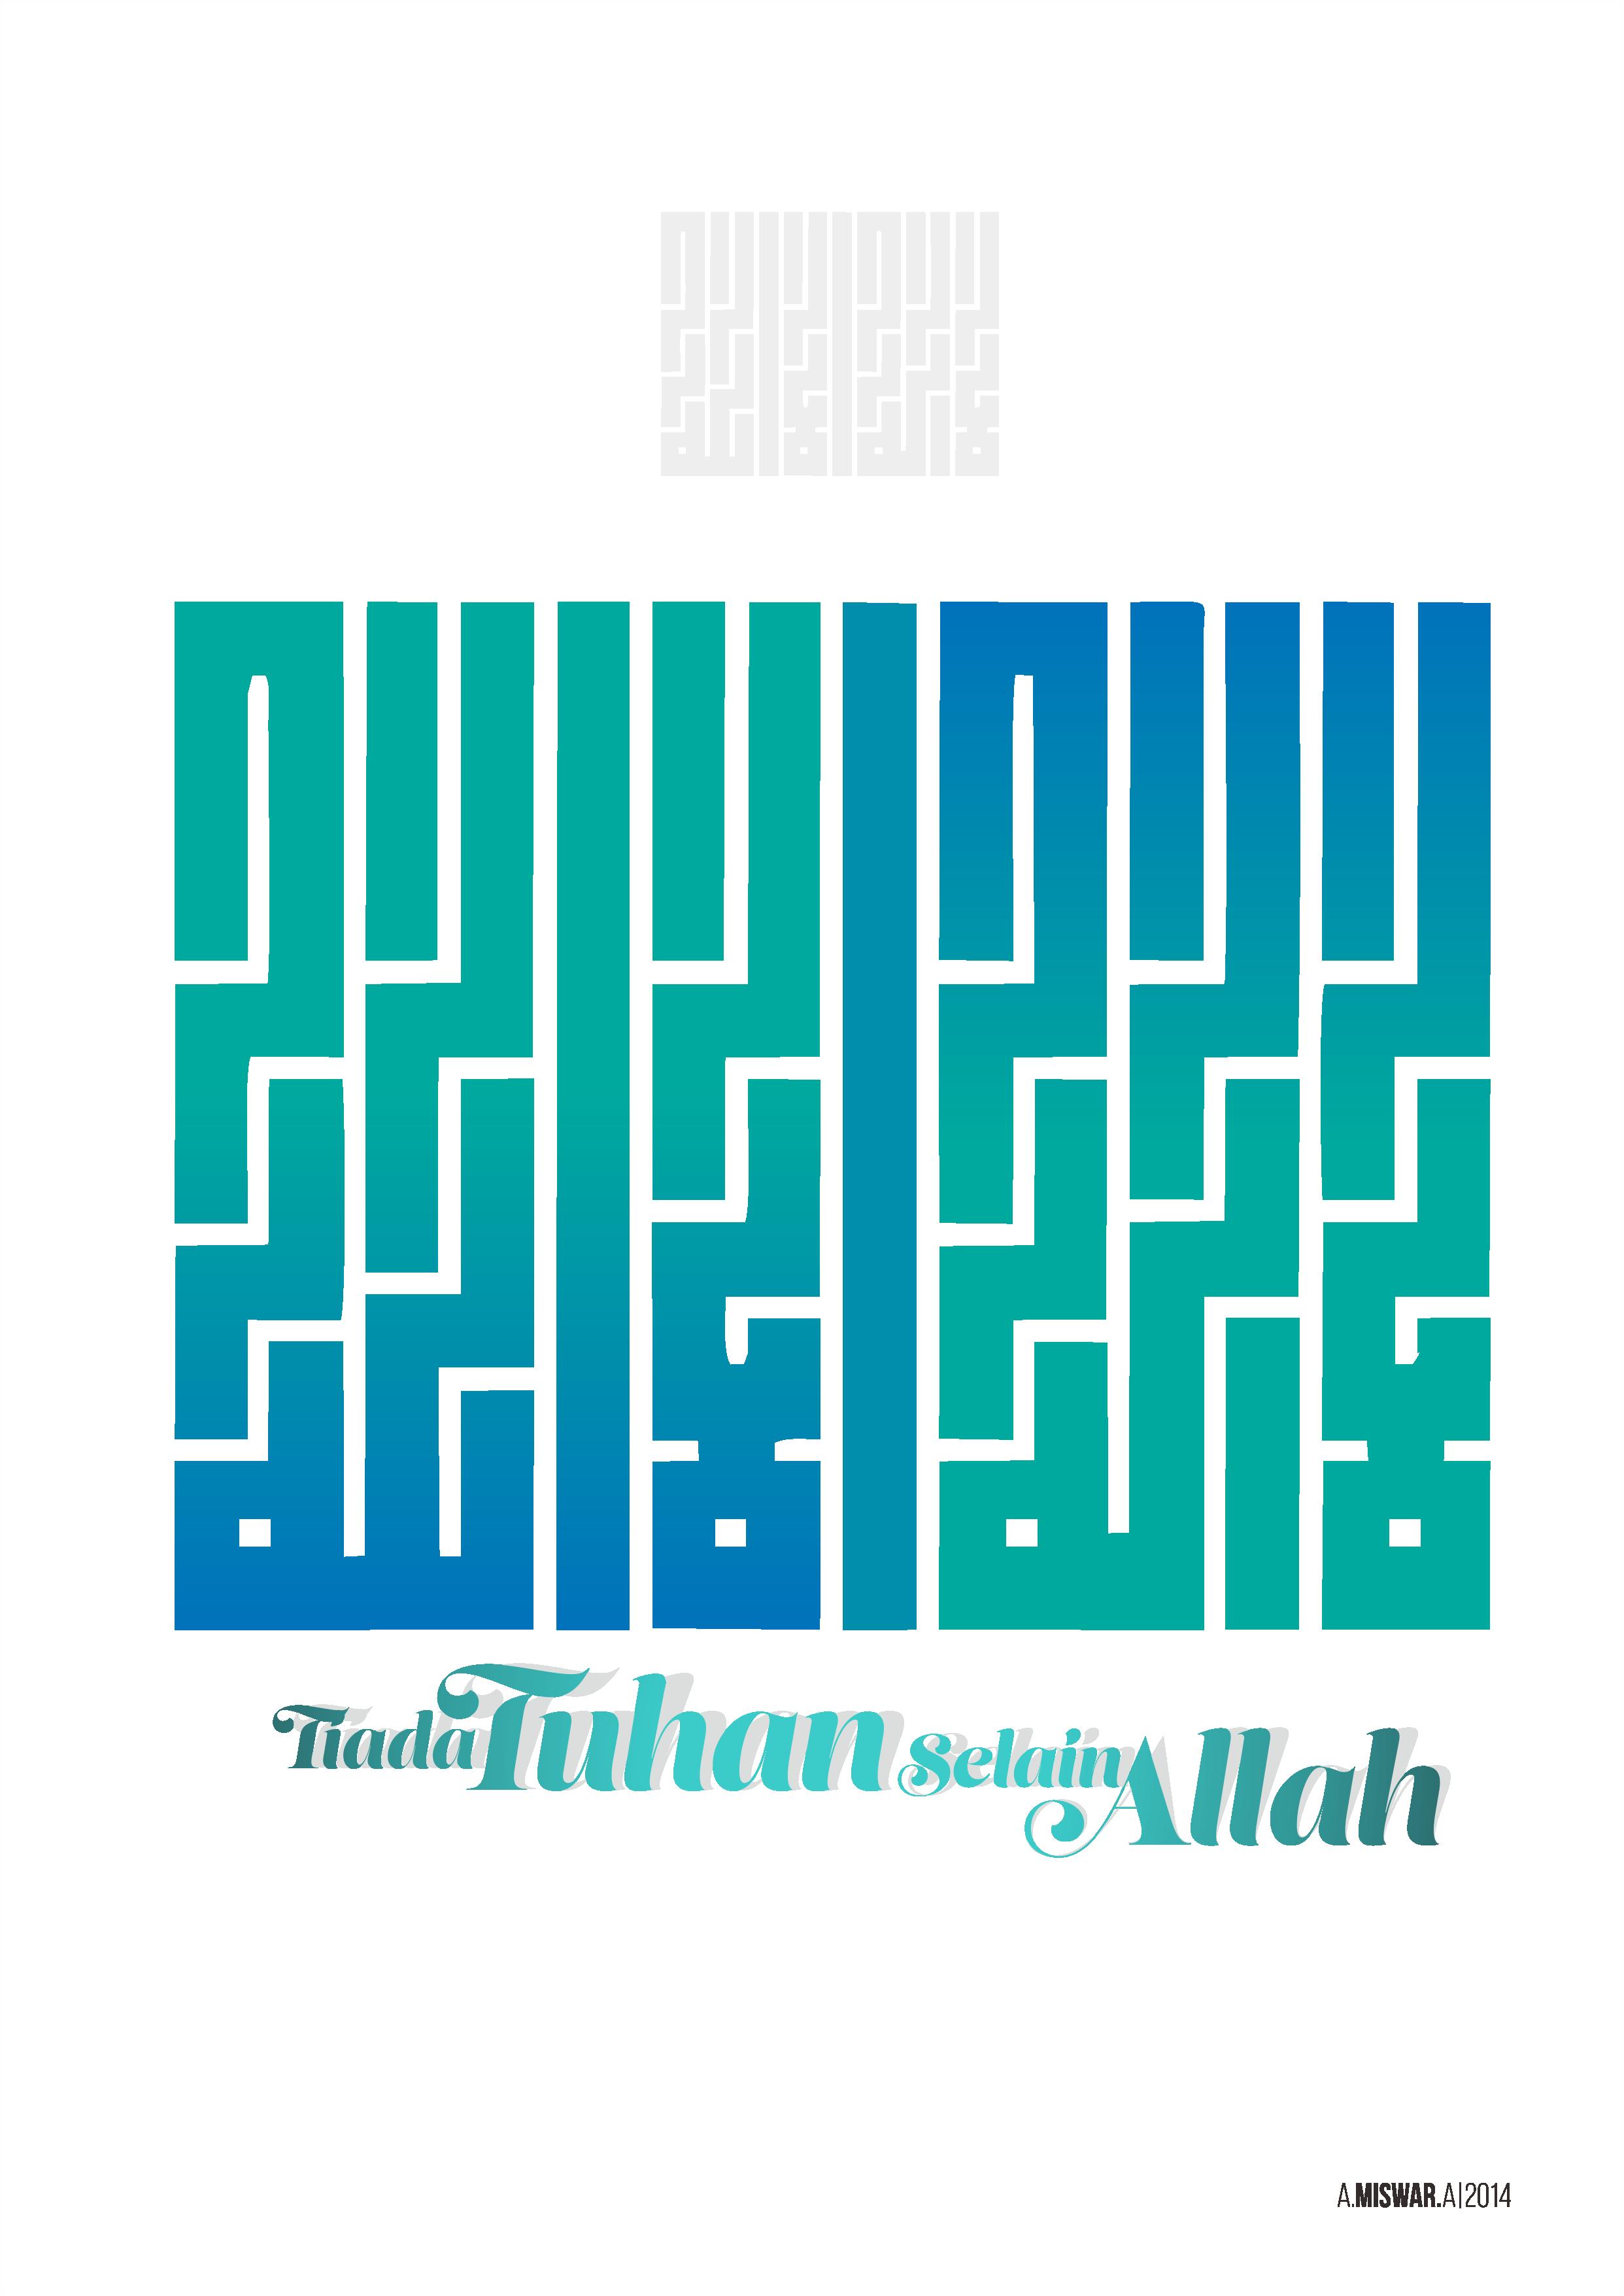 Tiada Tuhan Selain Allah Seni Kaligrafi Kaligrafi Islam Kaligrafi